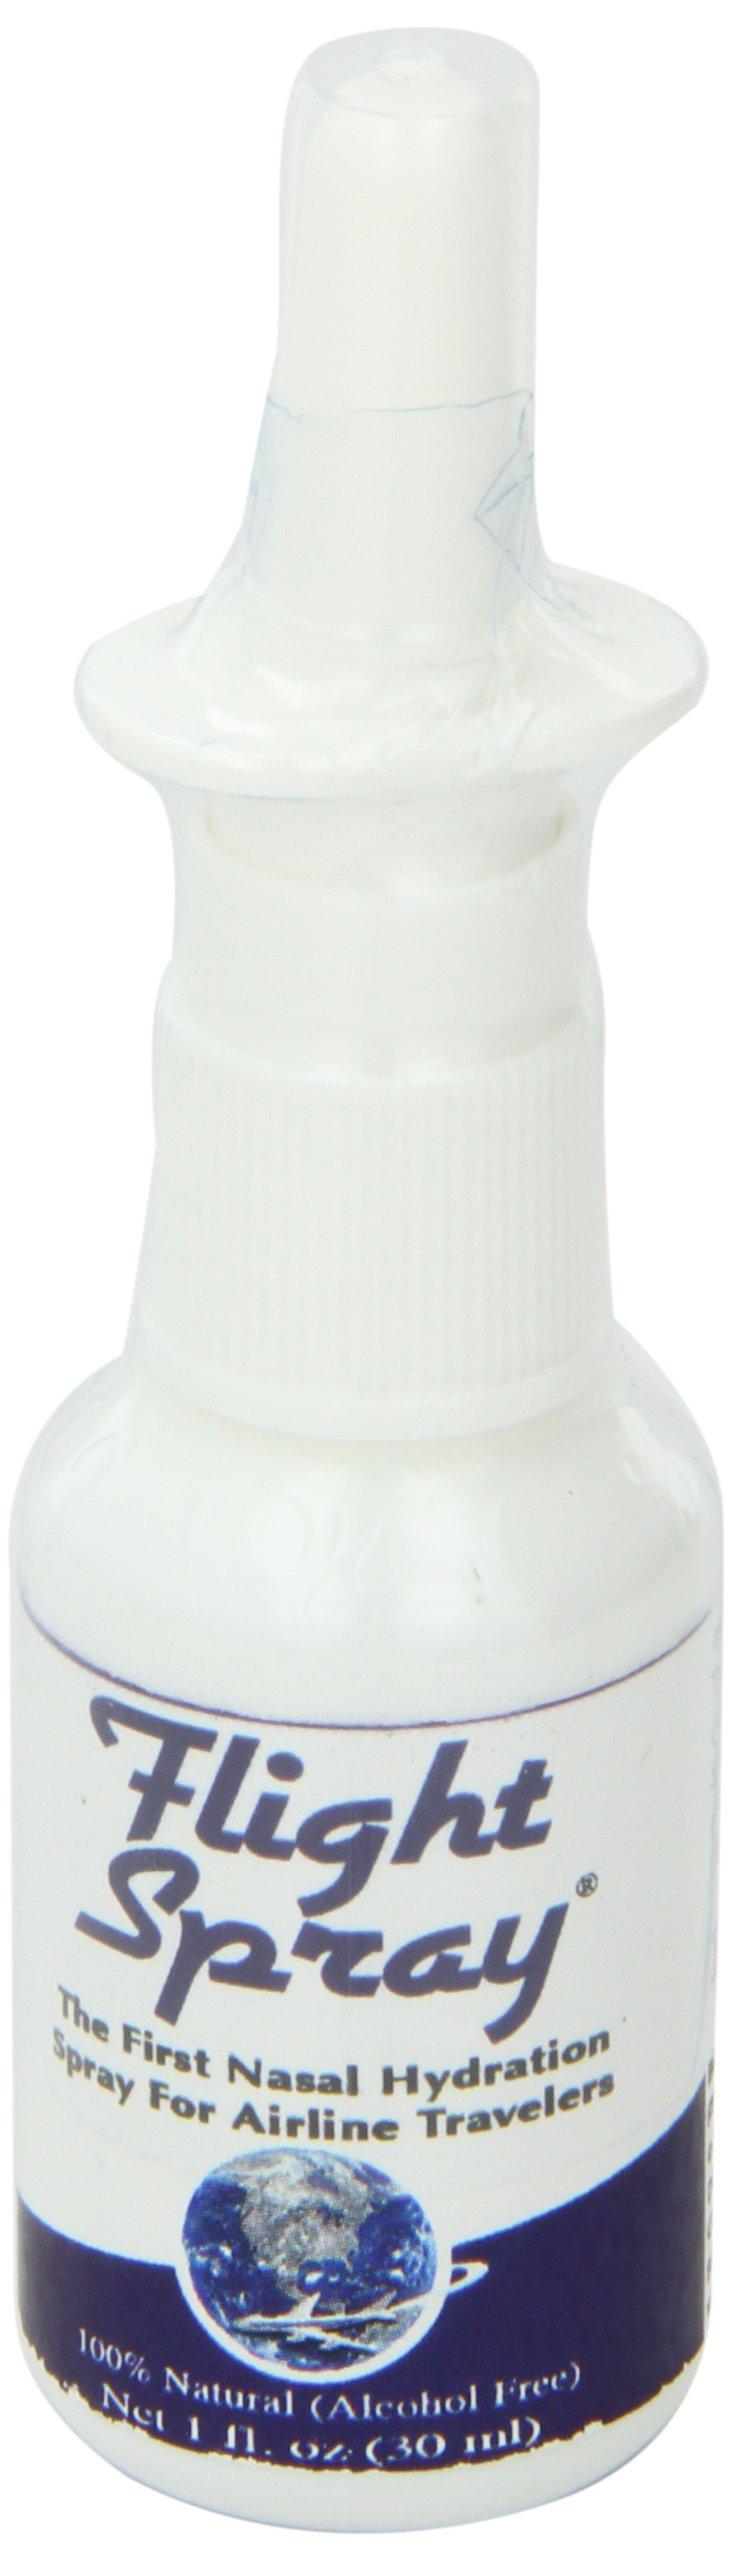 Flight Spray, Nasal Hydration Spray, 1 Ounce Bottle